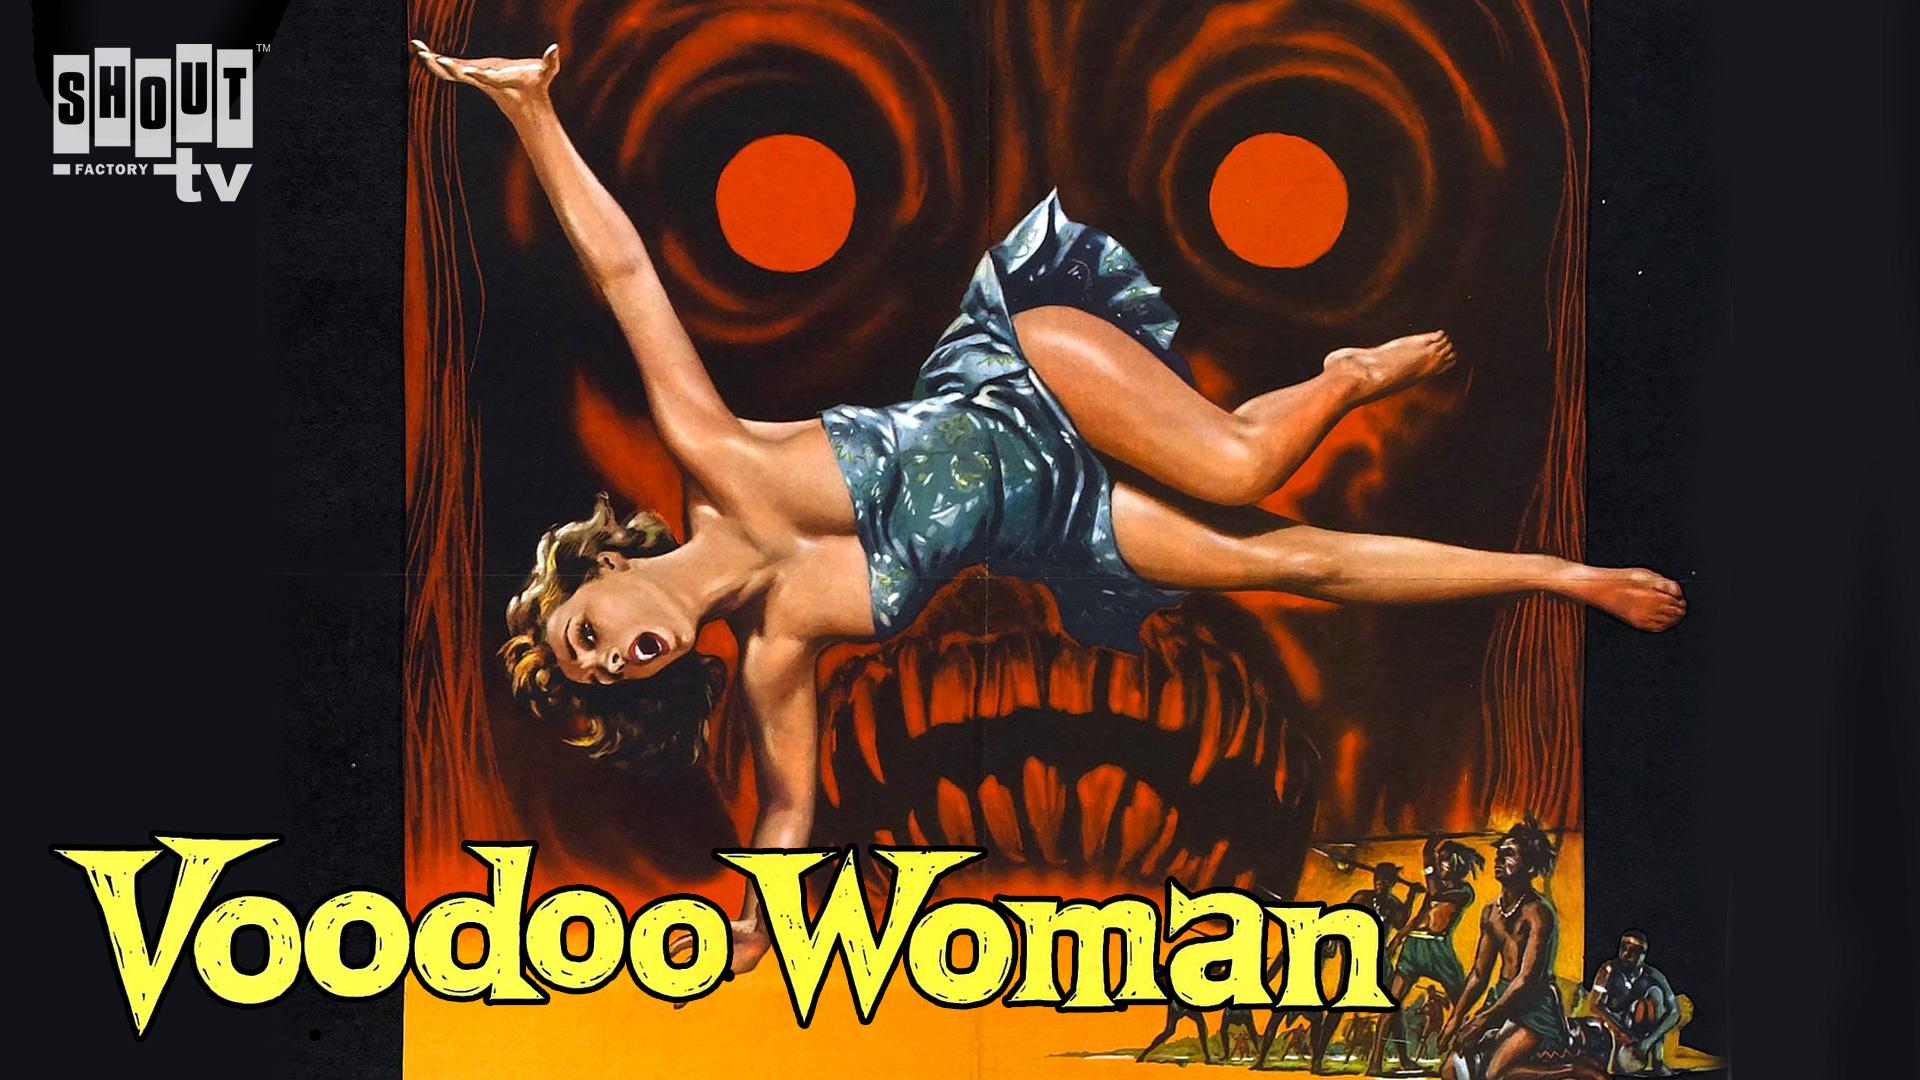 Voodoo Woman